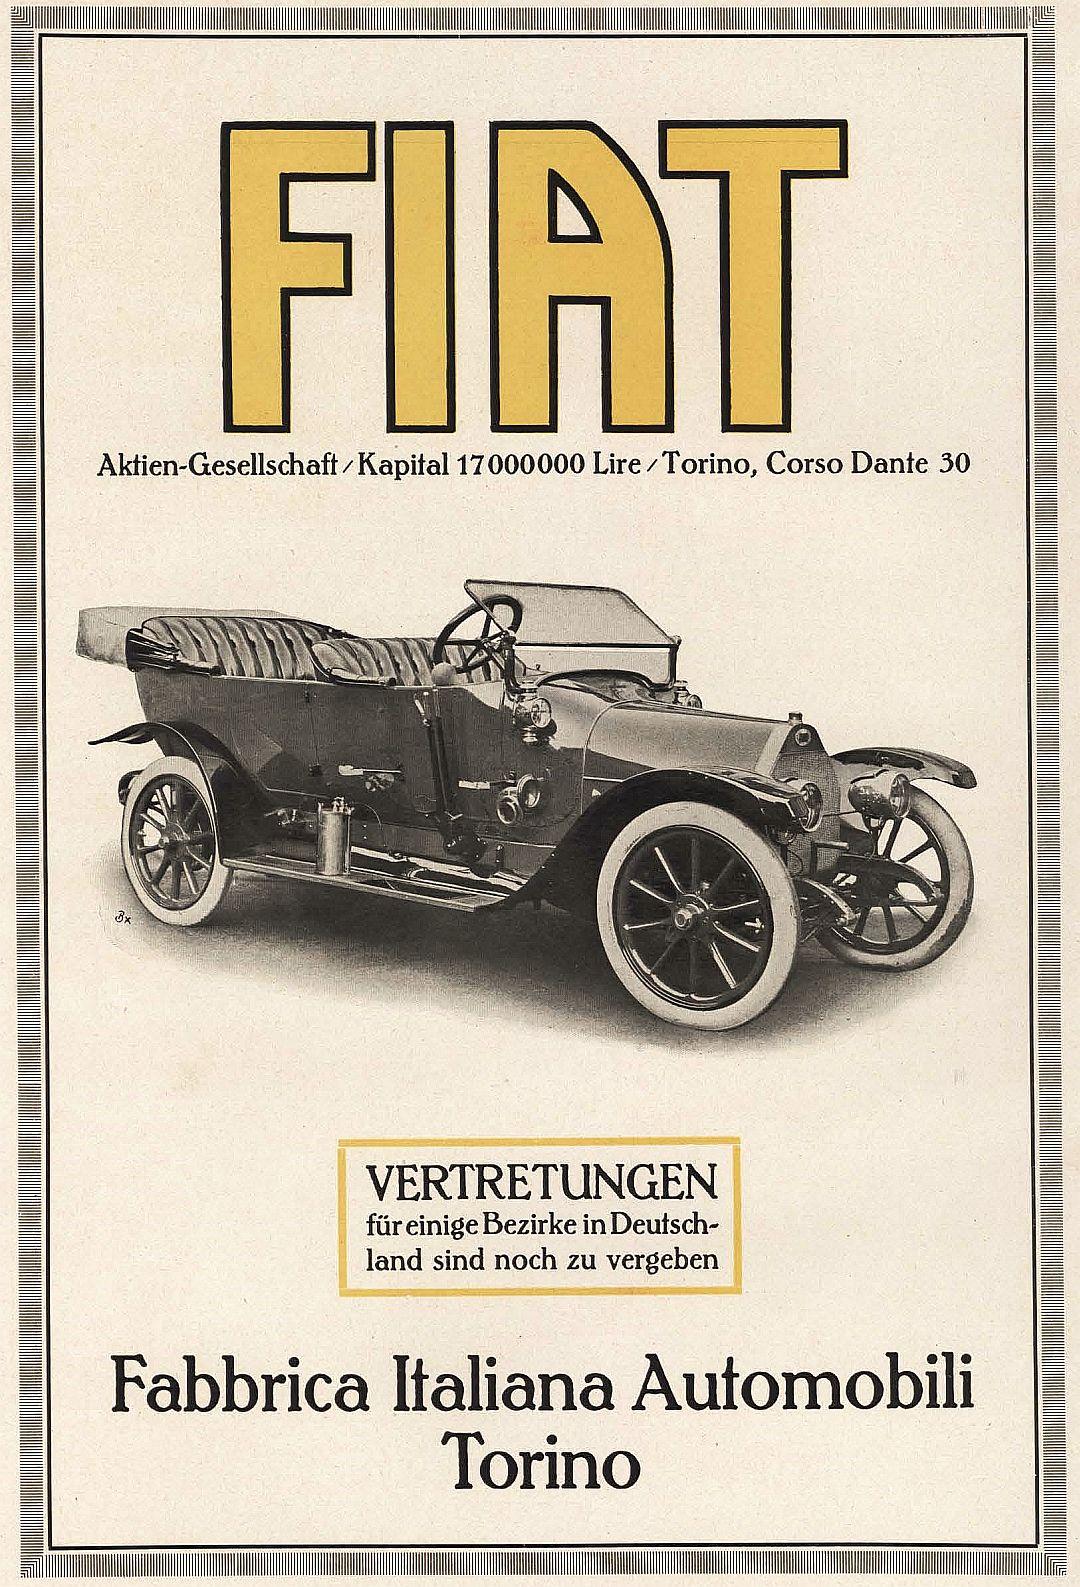 Fiat_Zero_Reklame_01-1914_Galerie